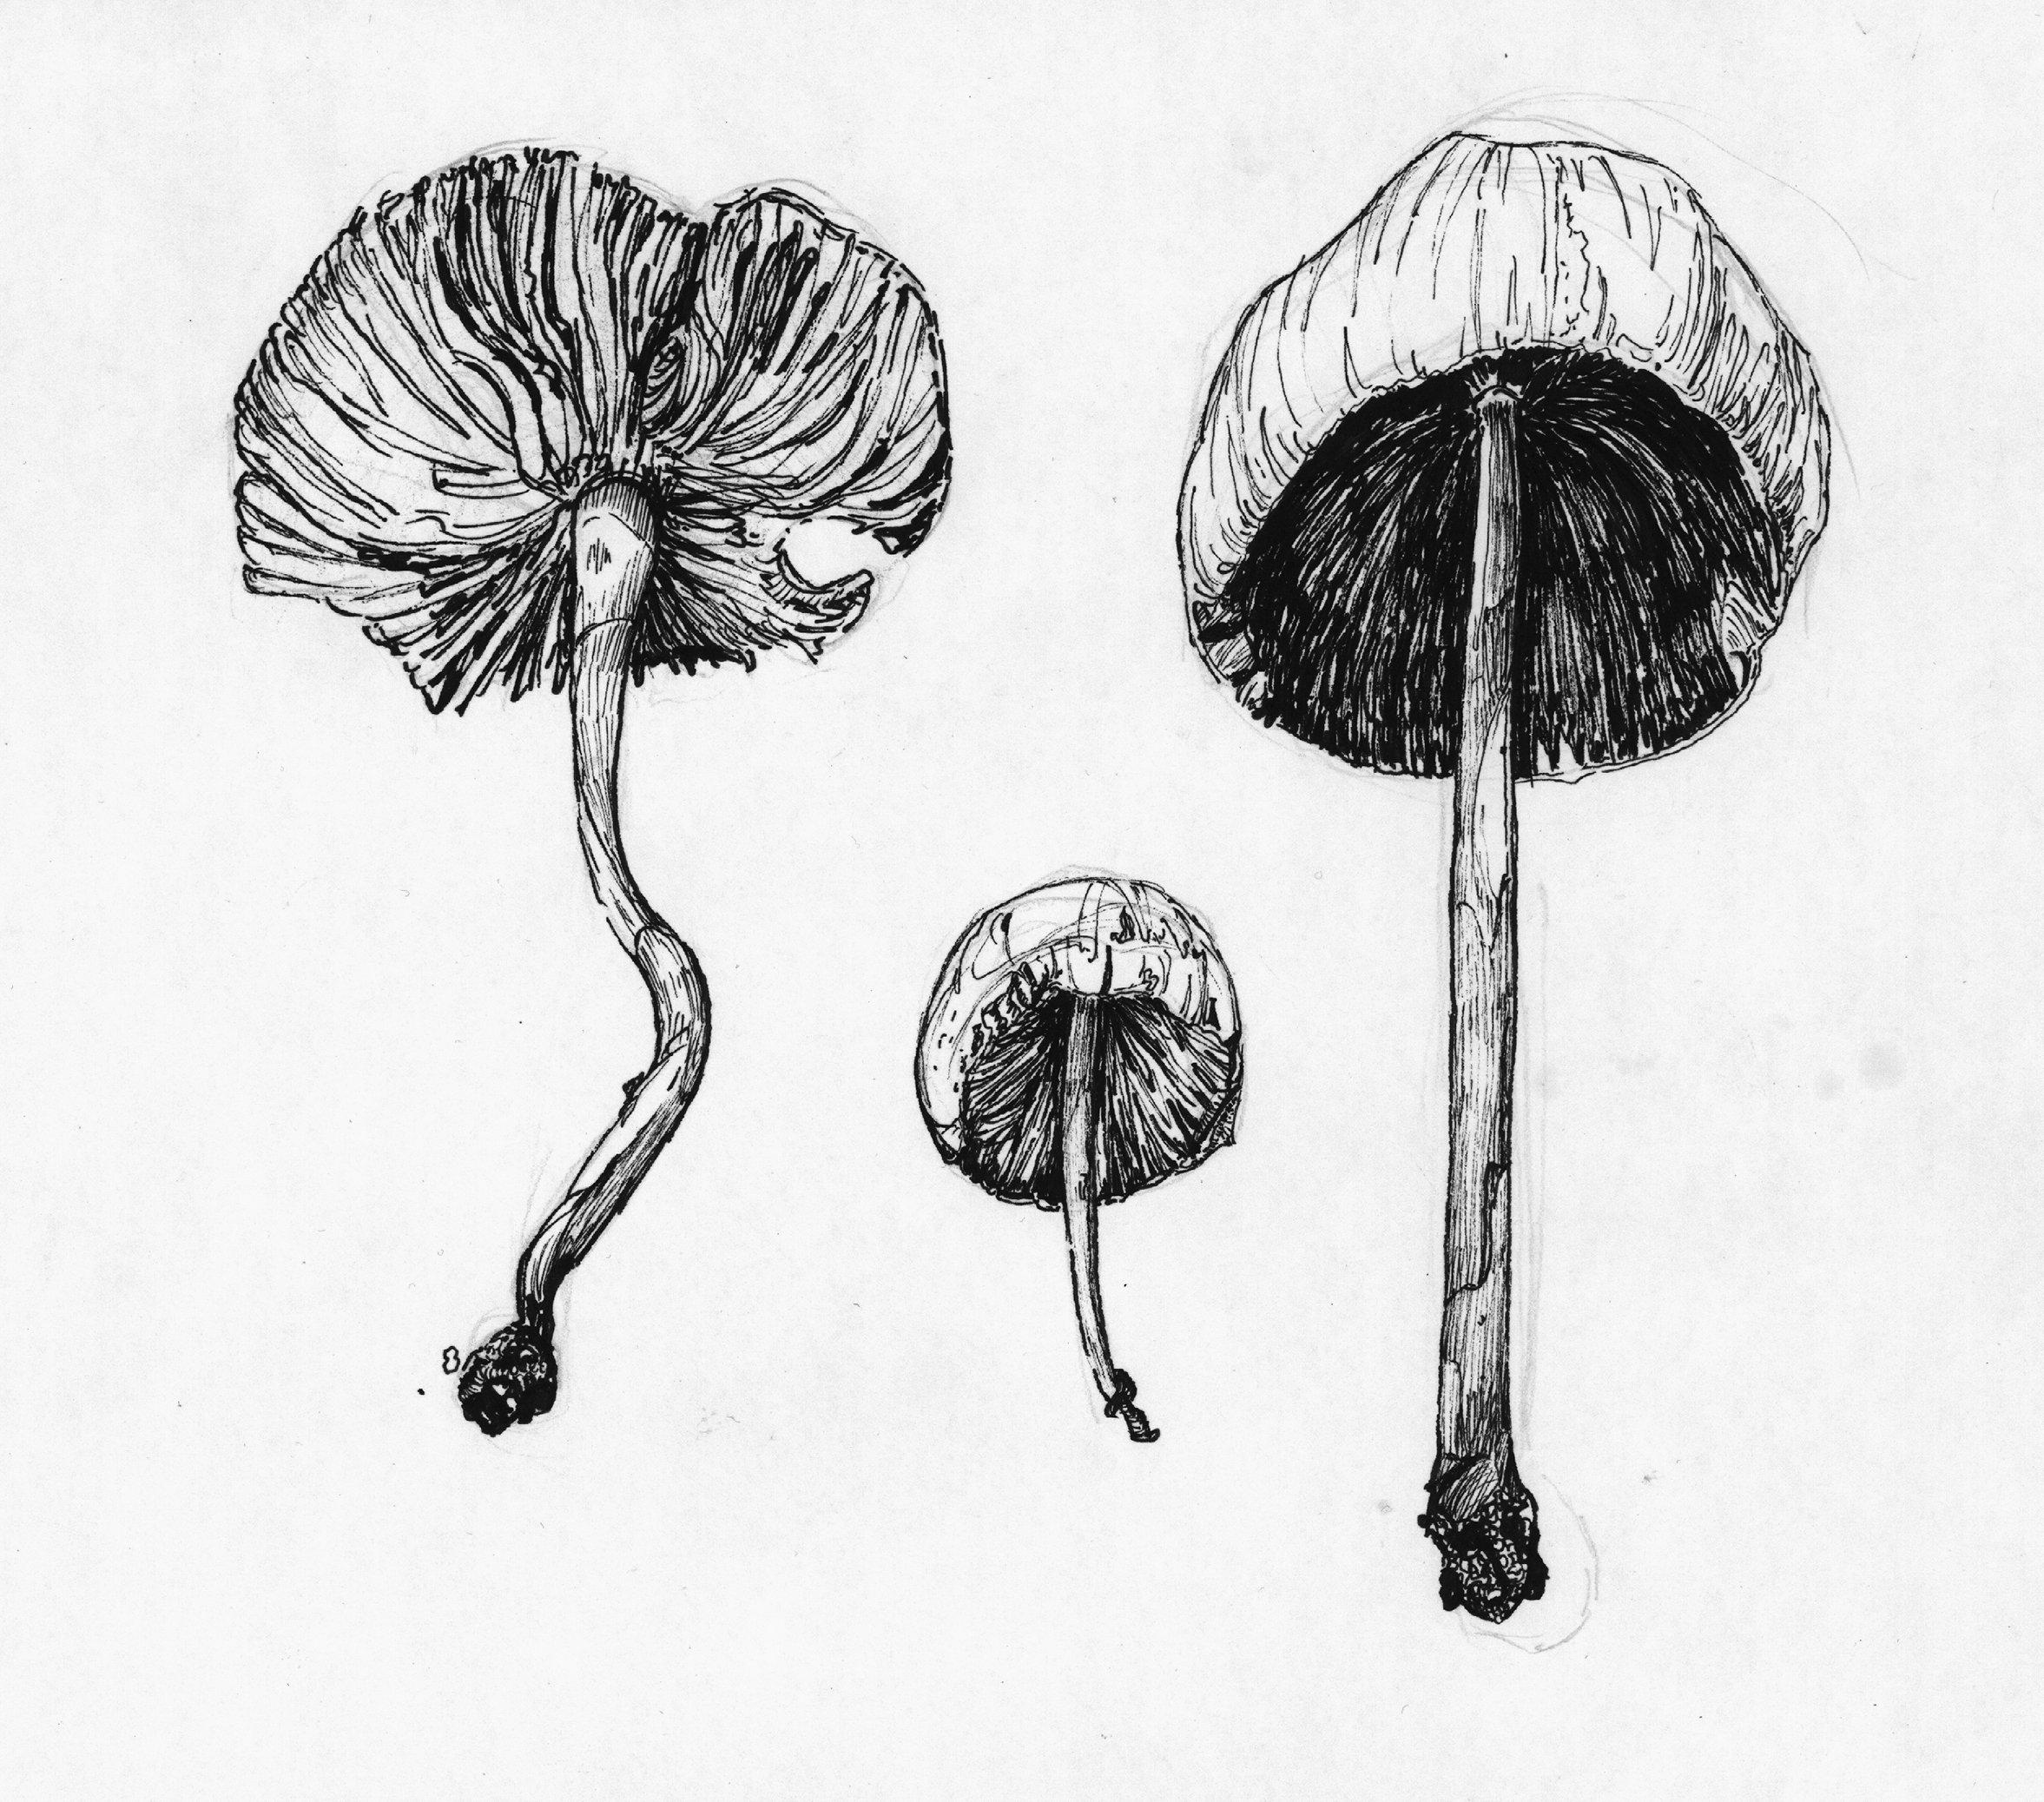 Wir - Mycelium Netzwerke